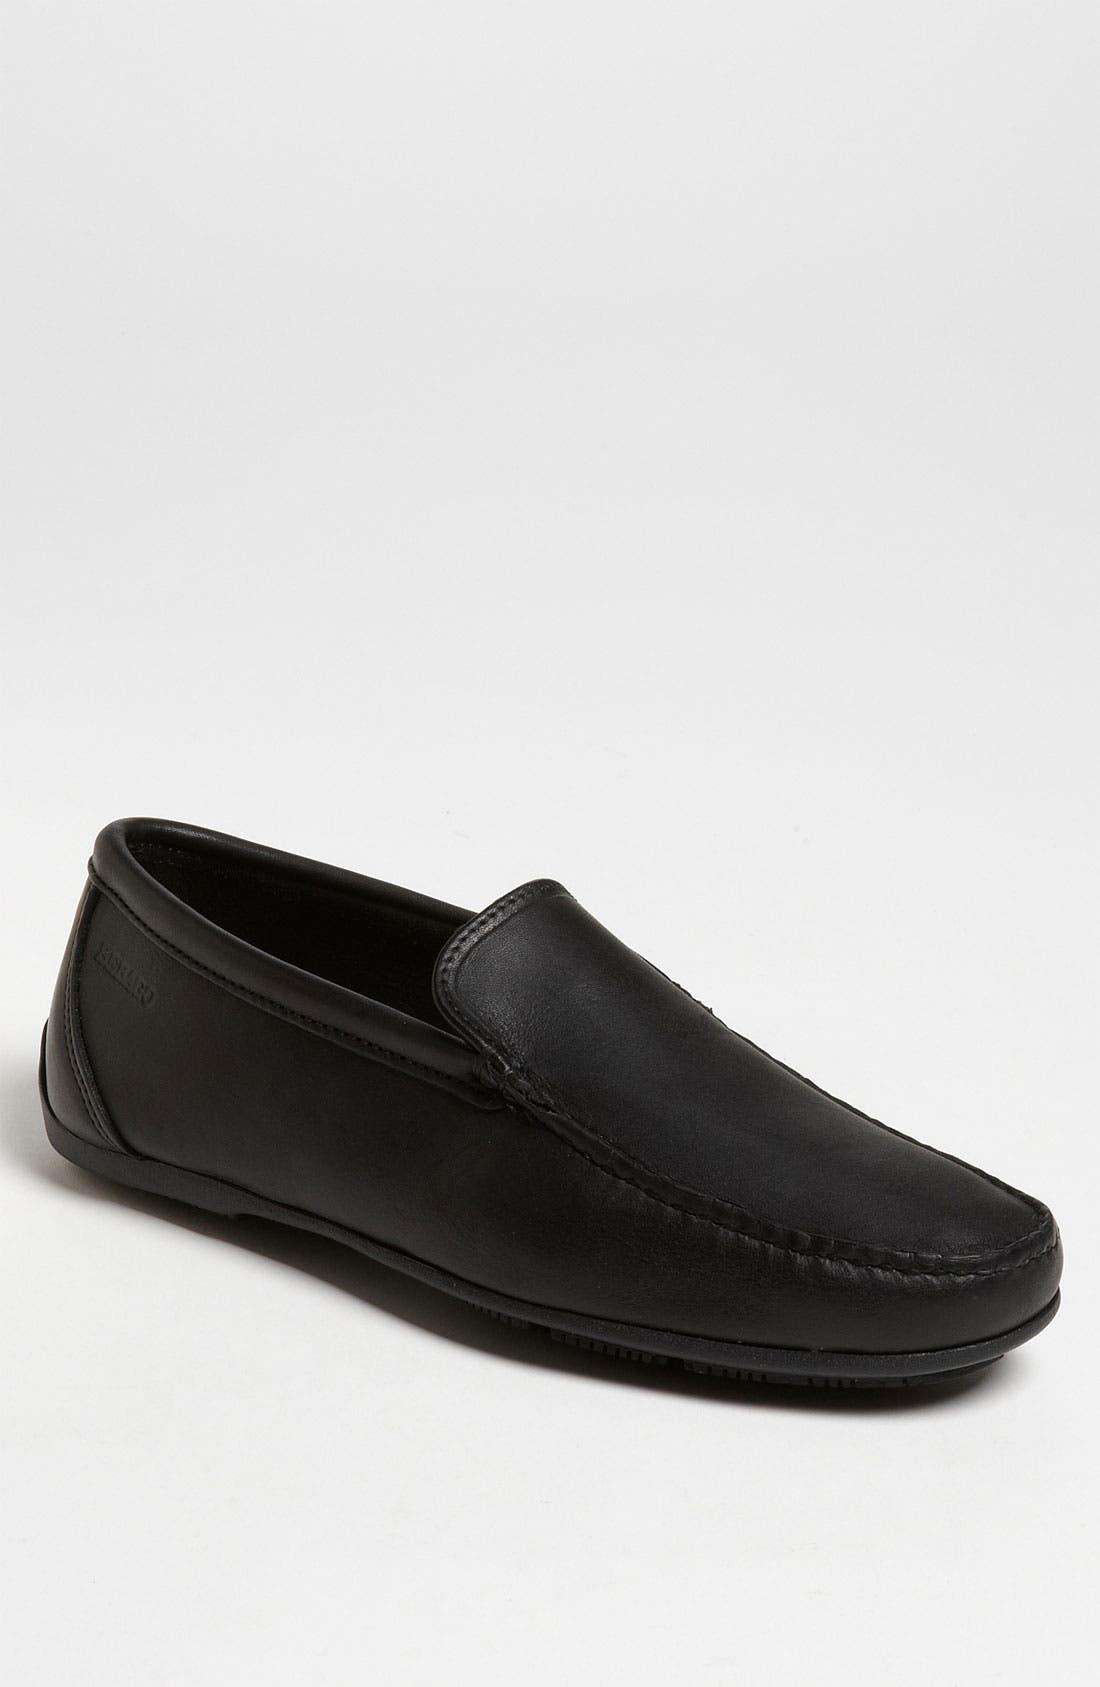 Main Image - Sebago 'Vico' Driving Shoe